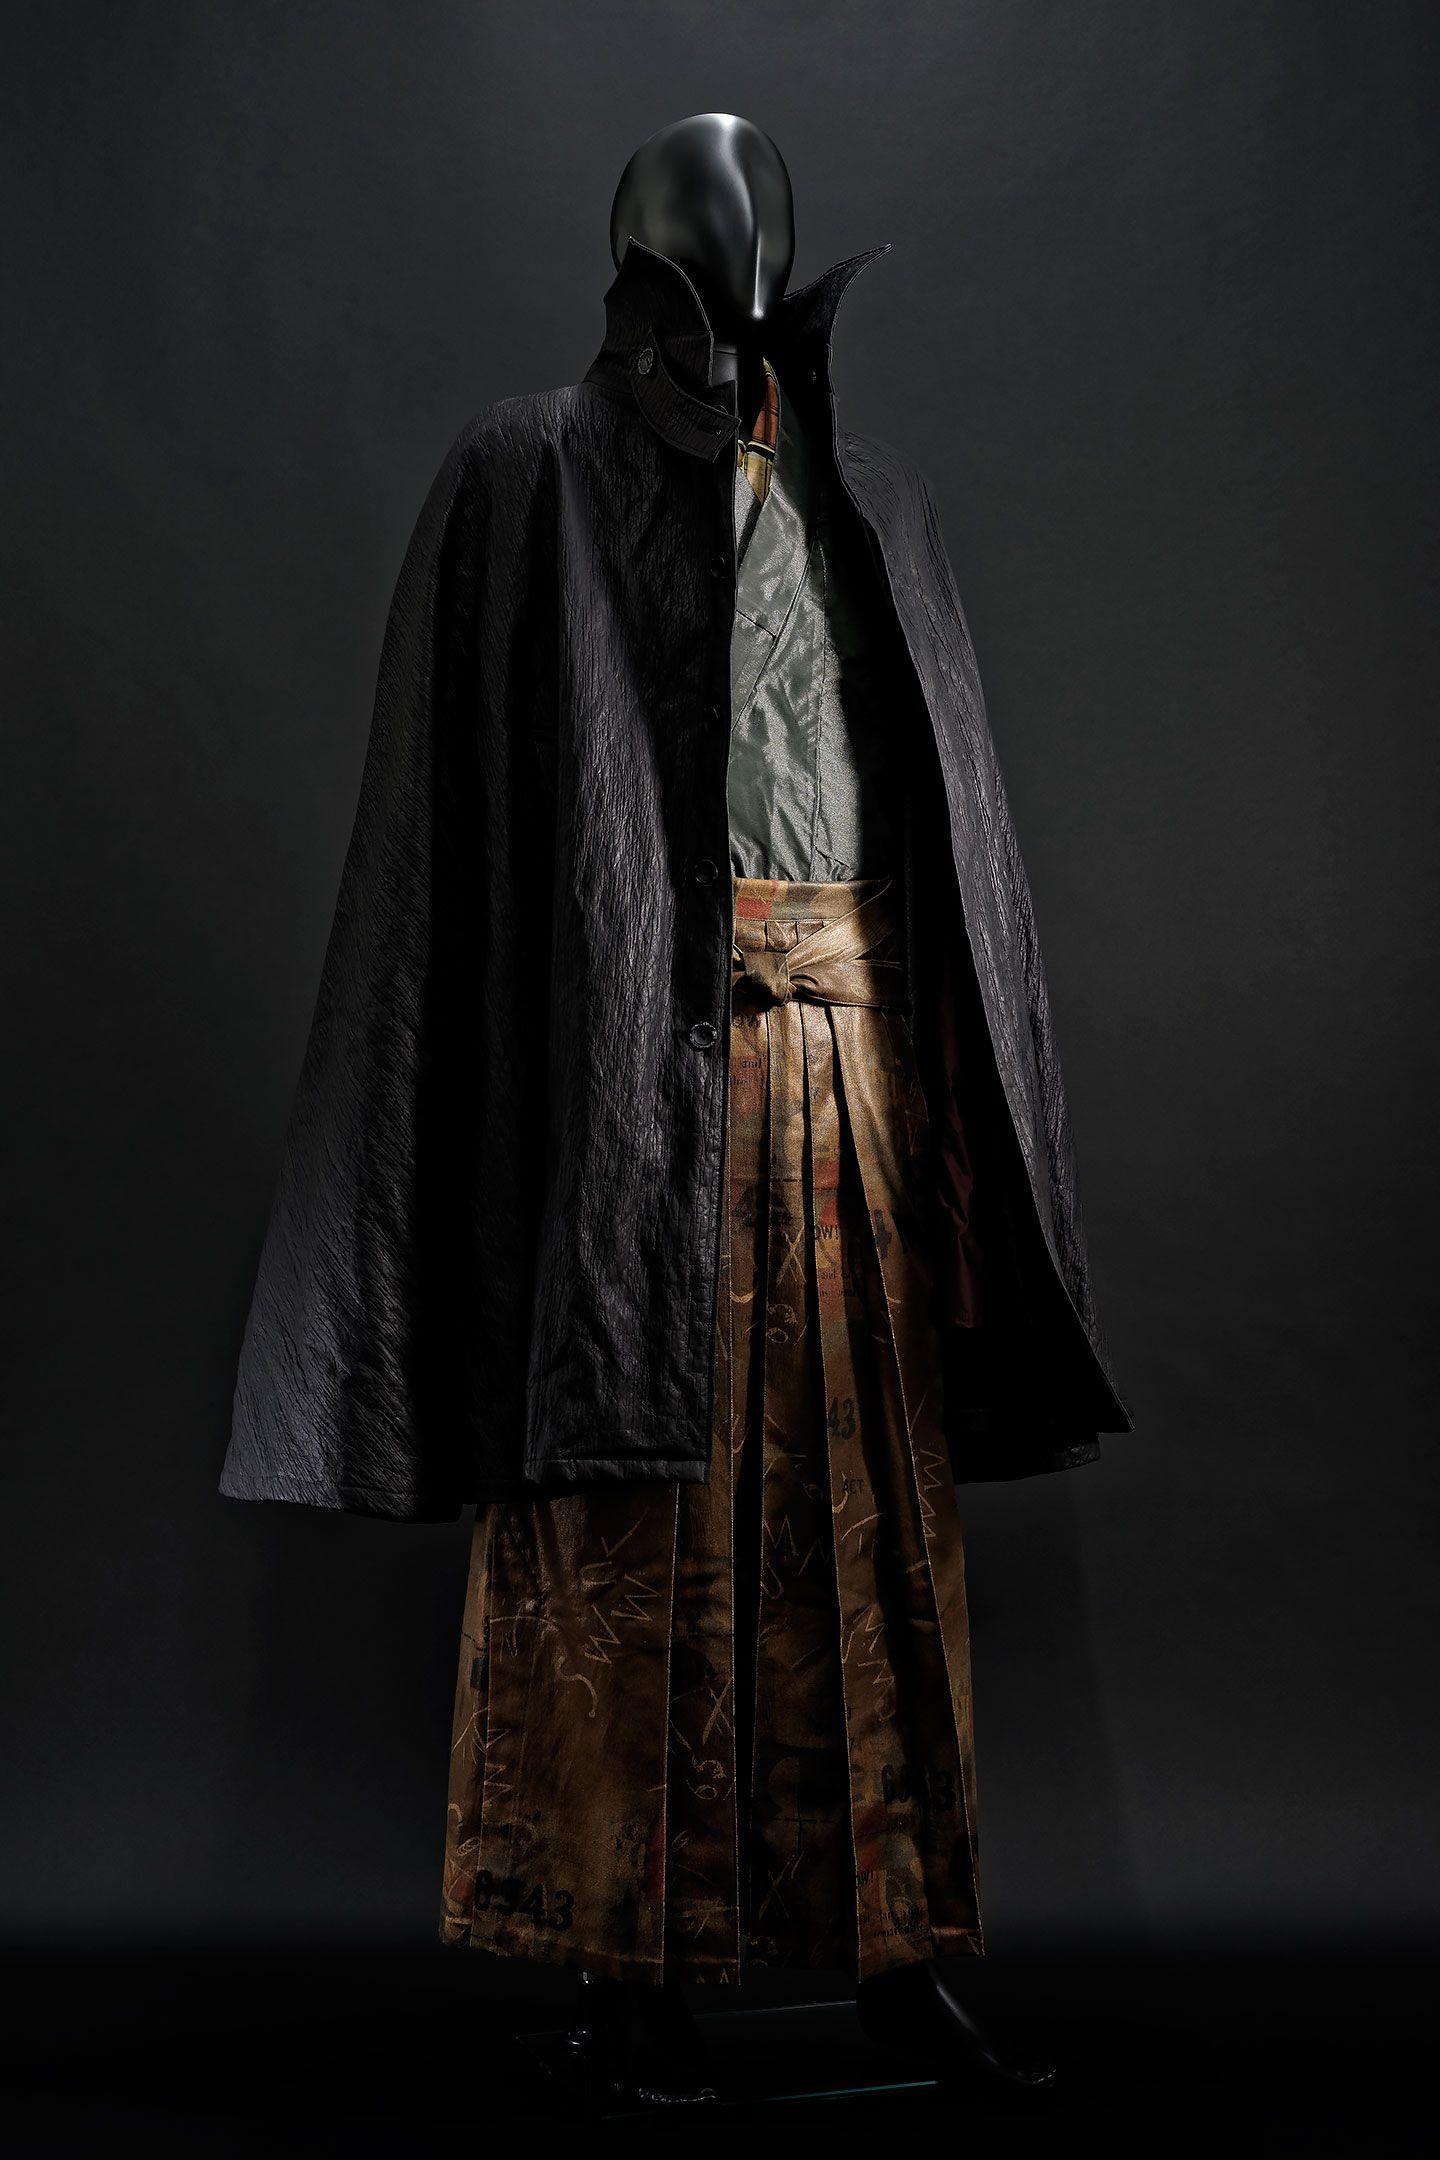 opus 7 shizukuya 10th anniversary limited collection kimono pinterest. Black Bedroom Furniture Sets. Home Design Ideas